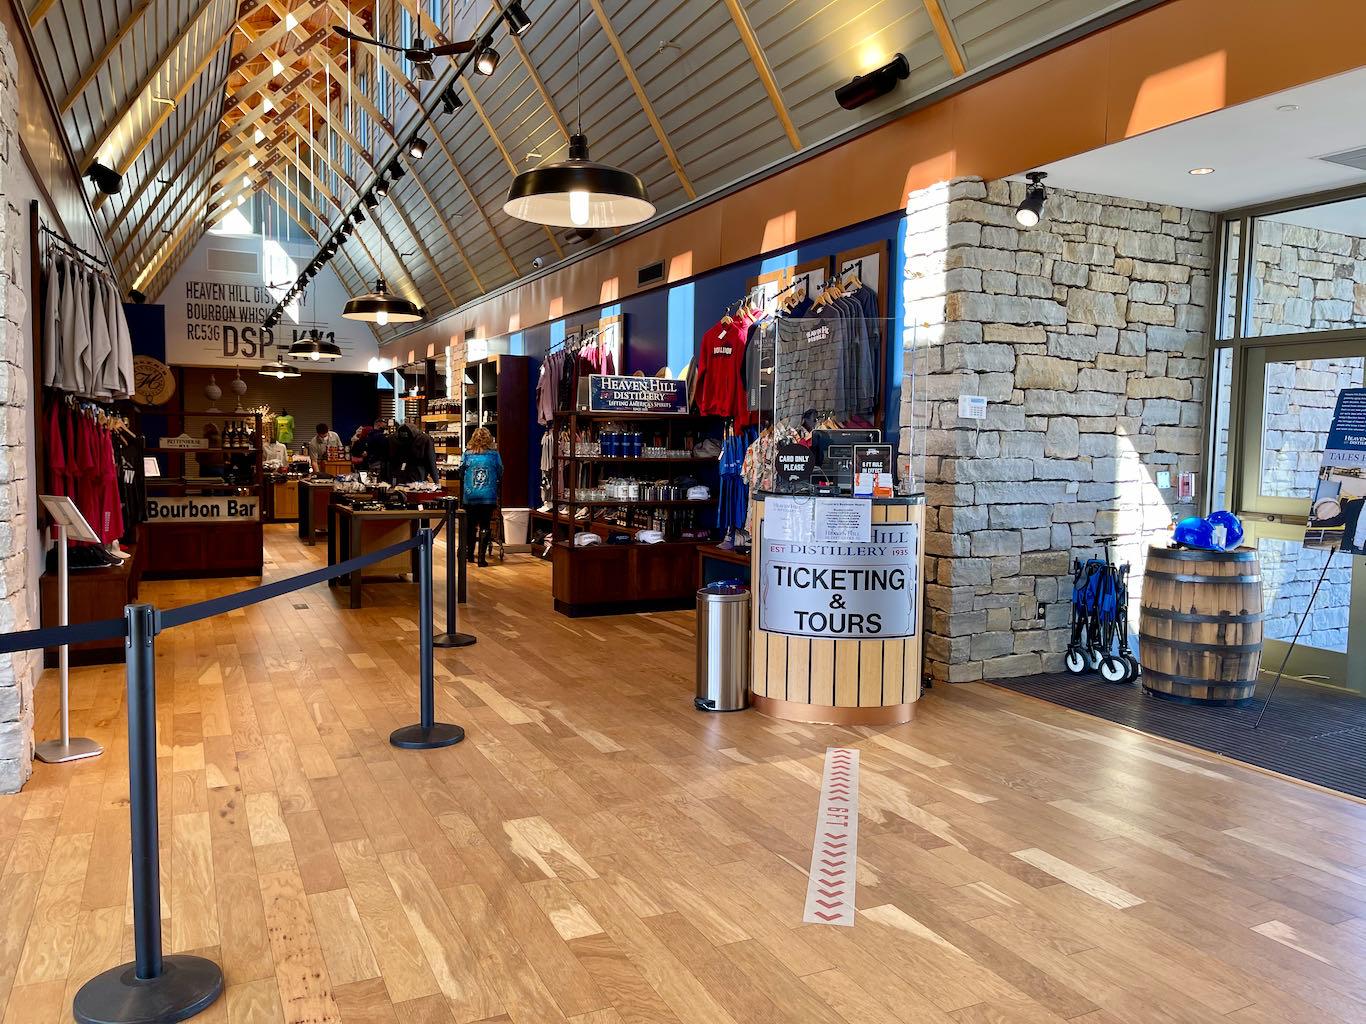 Heaven Hill Distillery Bourbon Heritage Center  Tour Check In